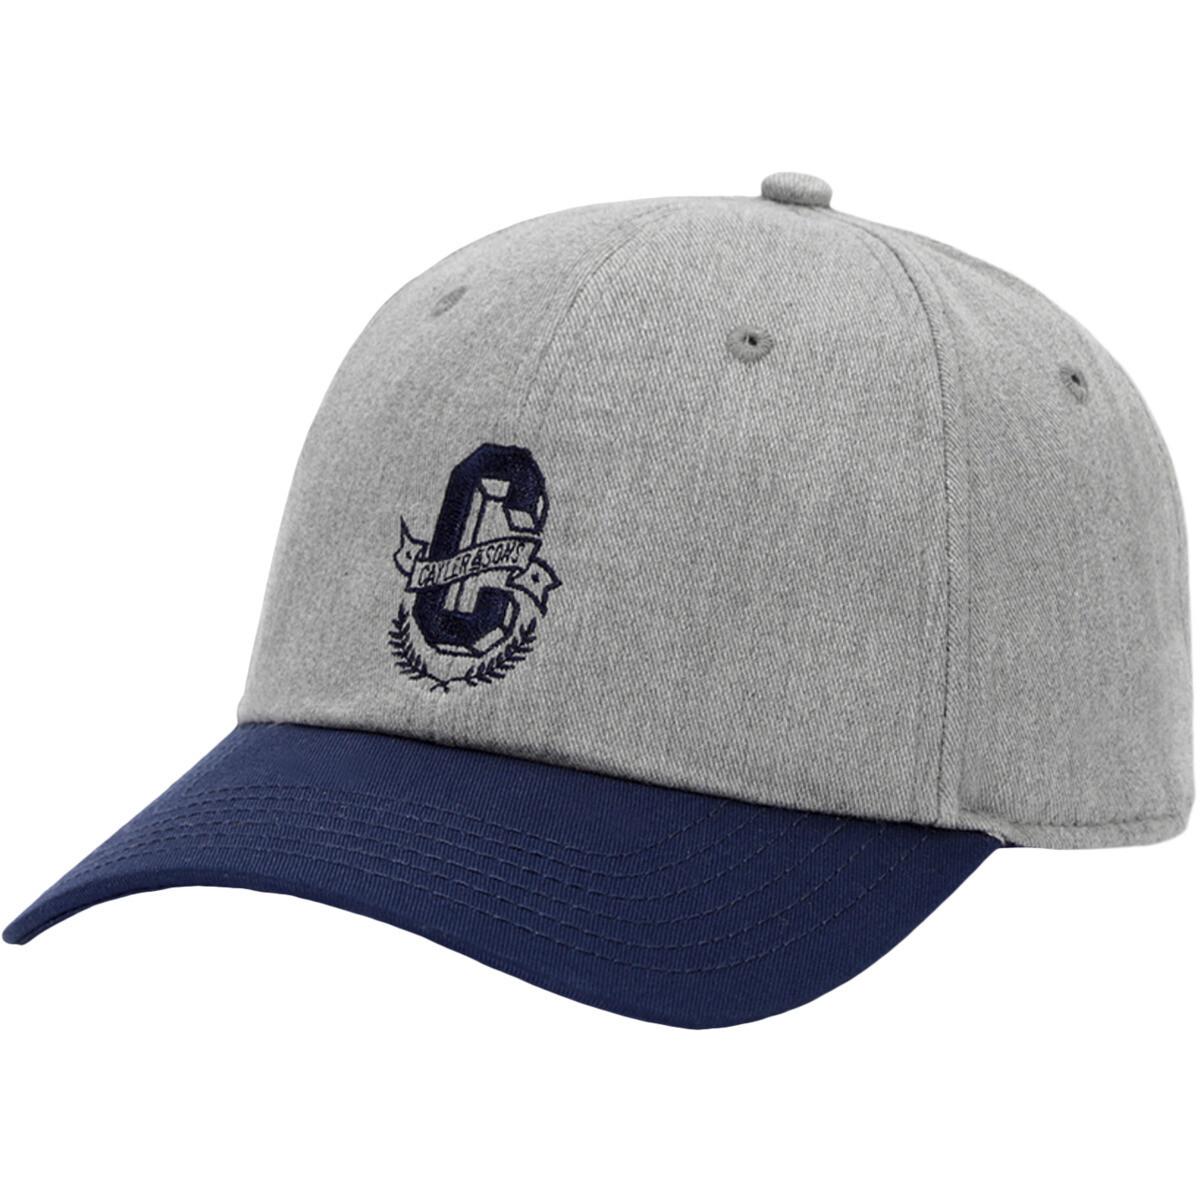 C&S WL Frat Boy Curved Cap